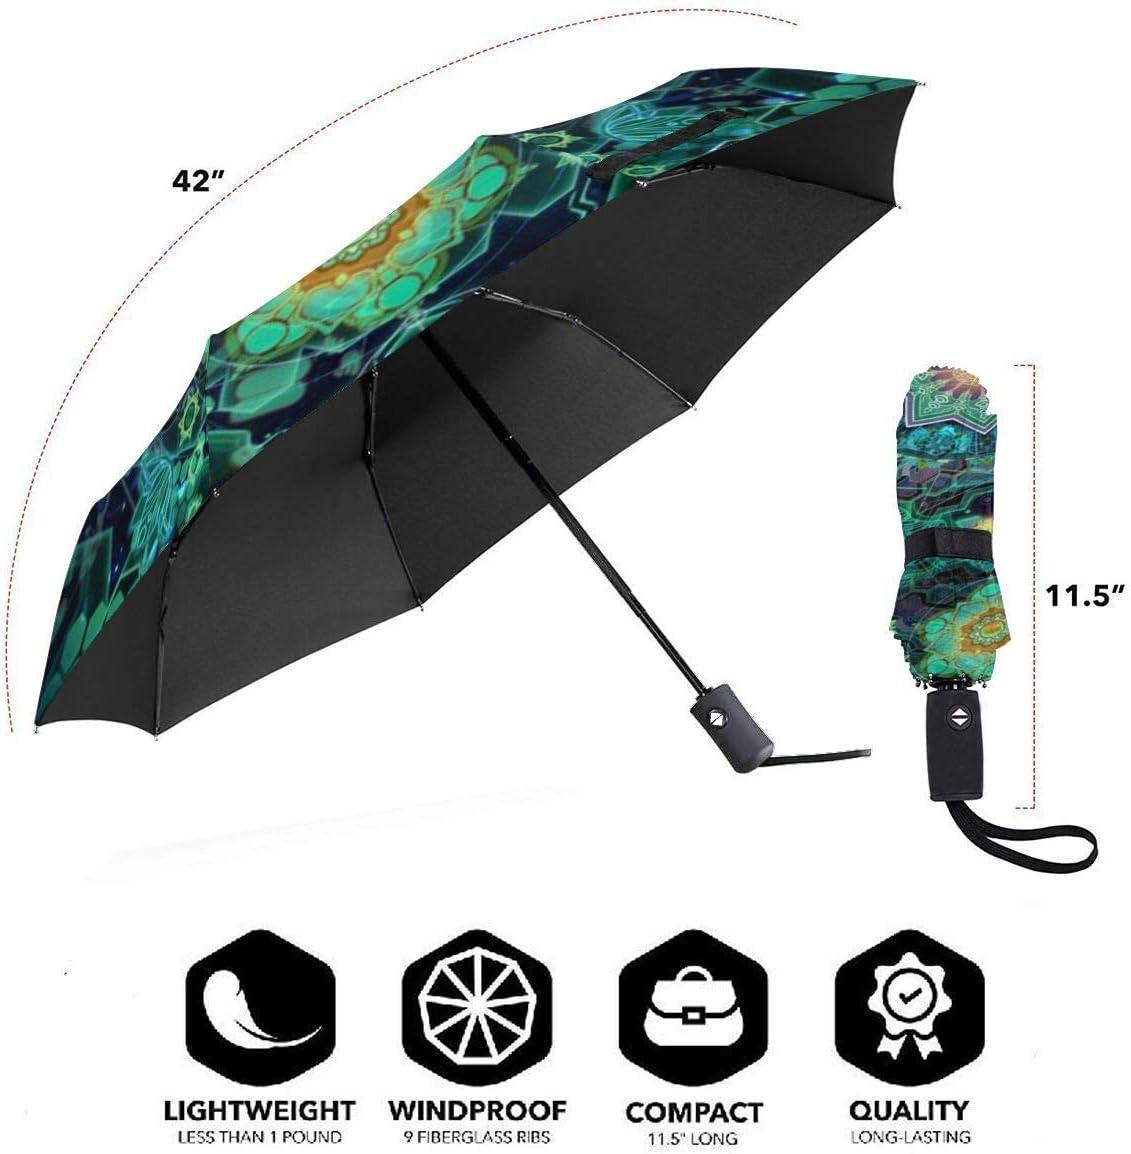 Psychedelic Visionary Art Umbrella Compact Rain/&Wind Repellent Umbrellas Sun Protection With Anti UV Coating Travel Auto Folding Umbrella